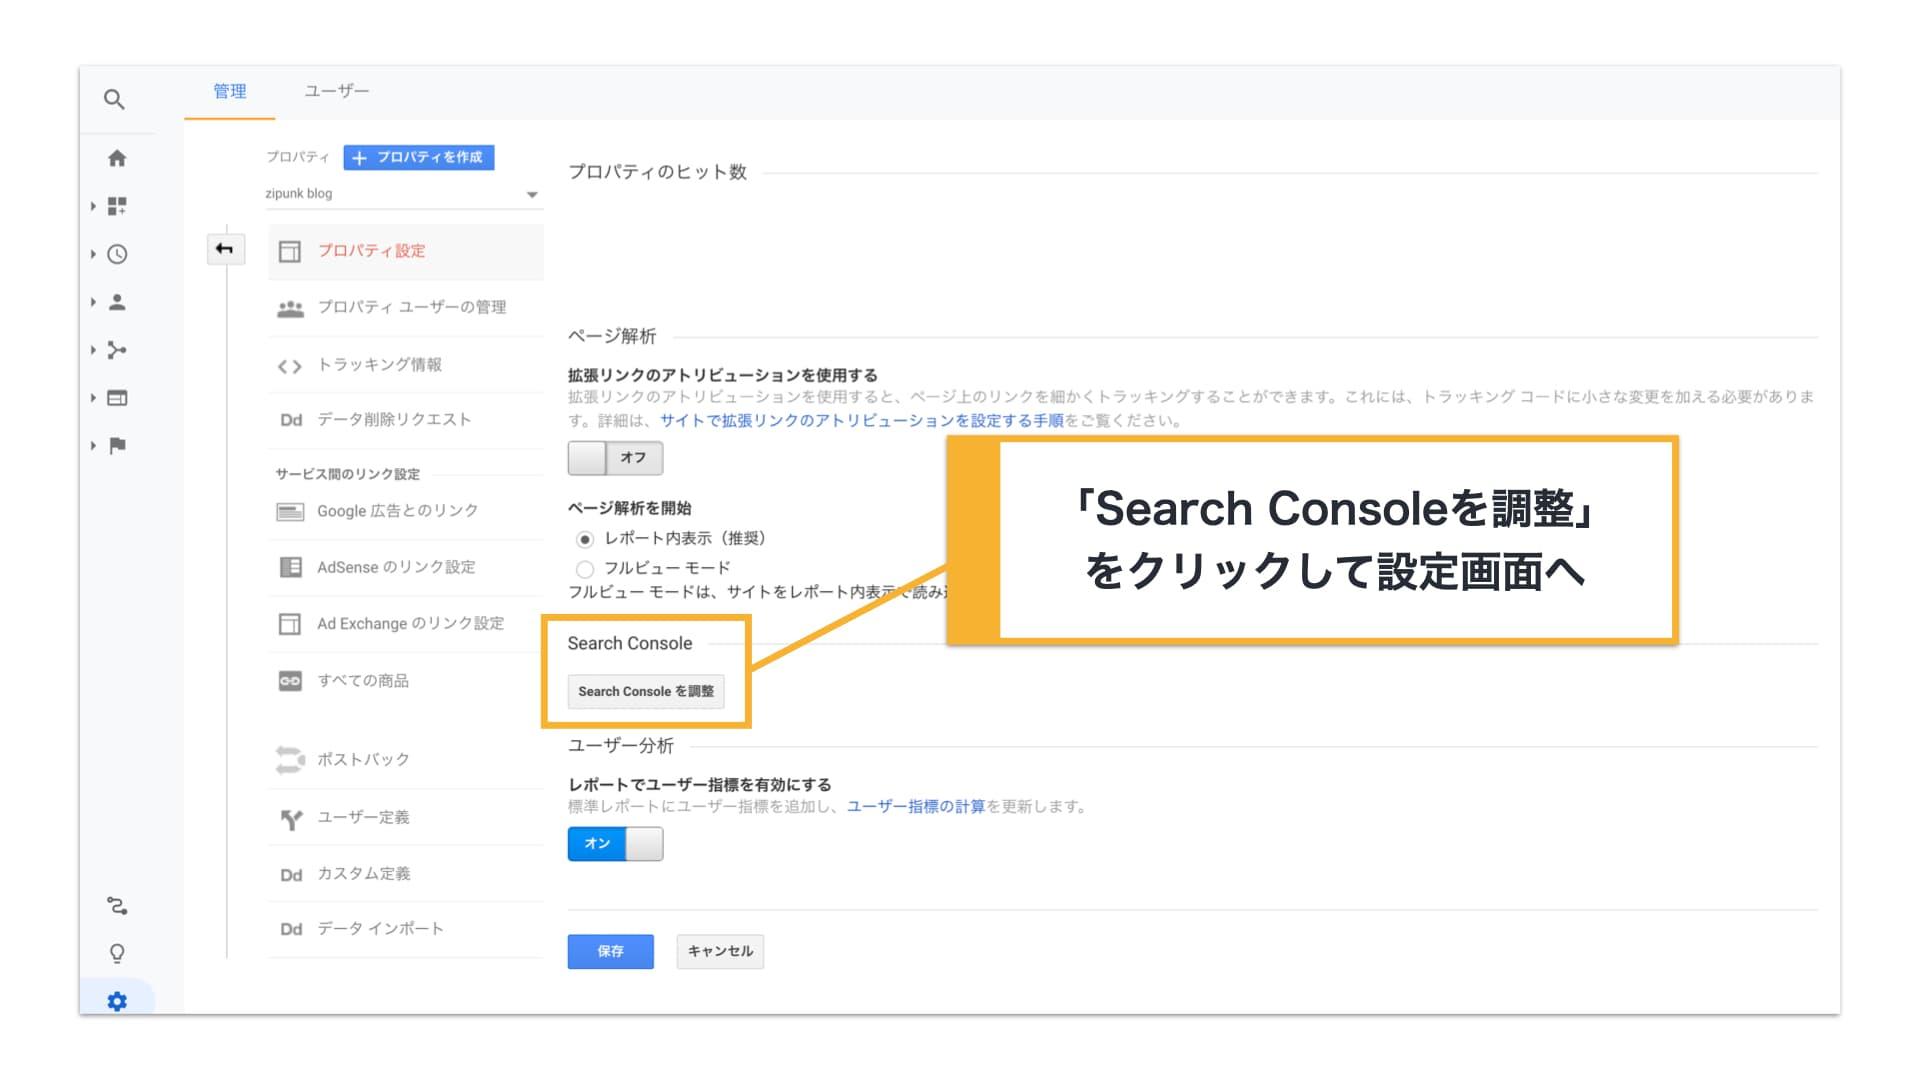 ga-initial-settings-search-console-setting